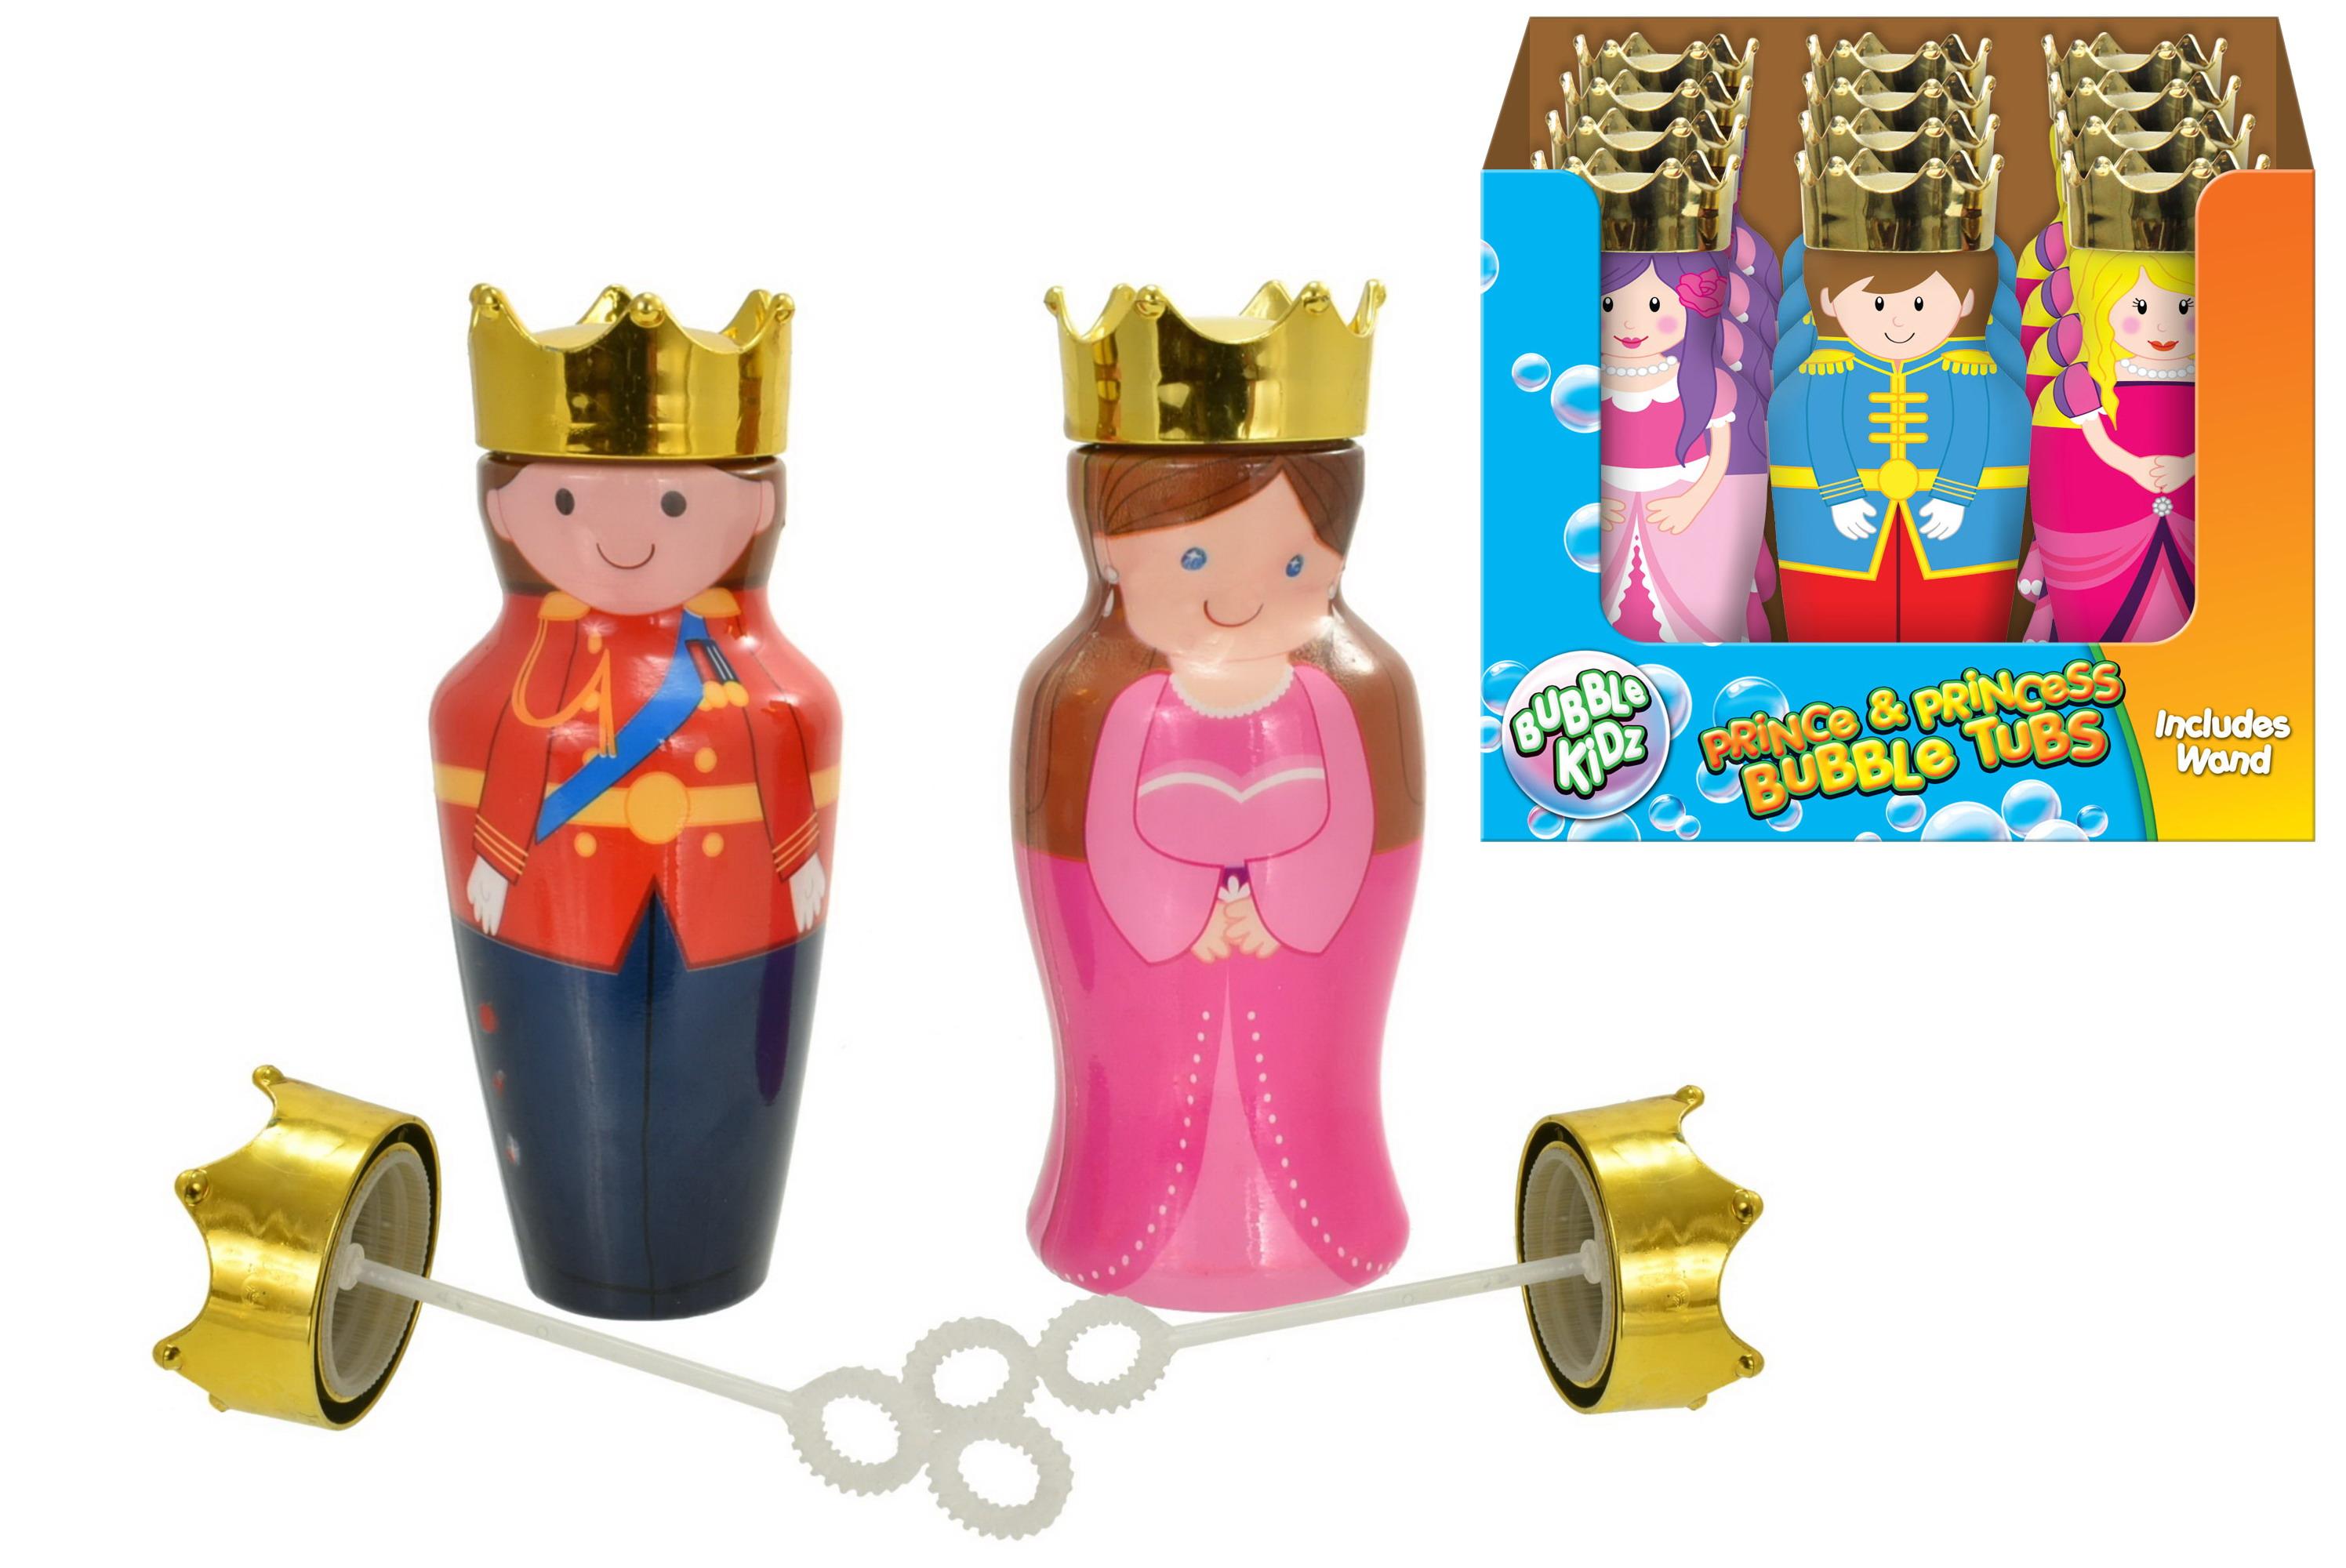 Prince & Princess Bubble Tubs In Display Box